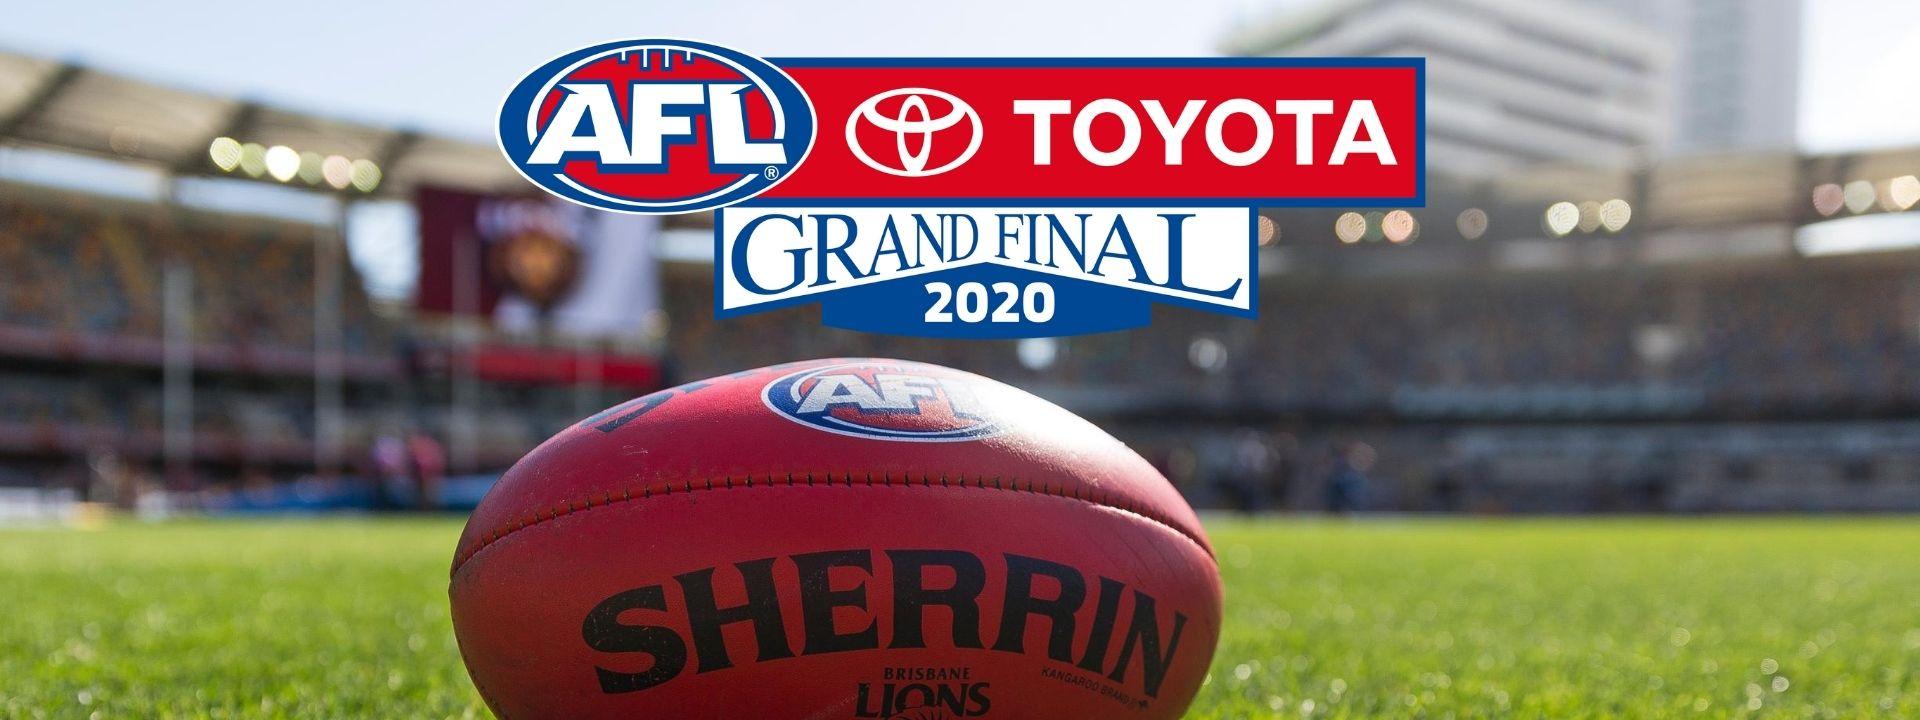 AFL Grand Final - pre and post match entertainment [Brisbane]